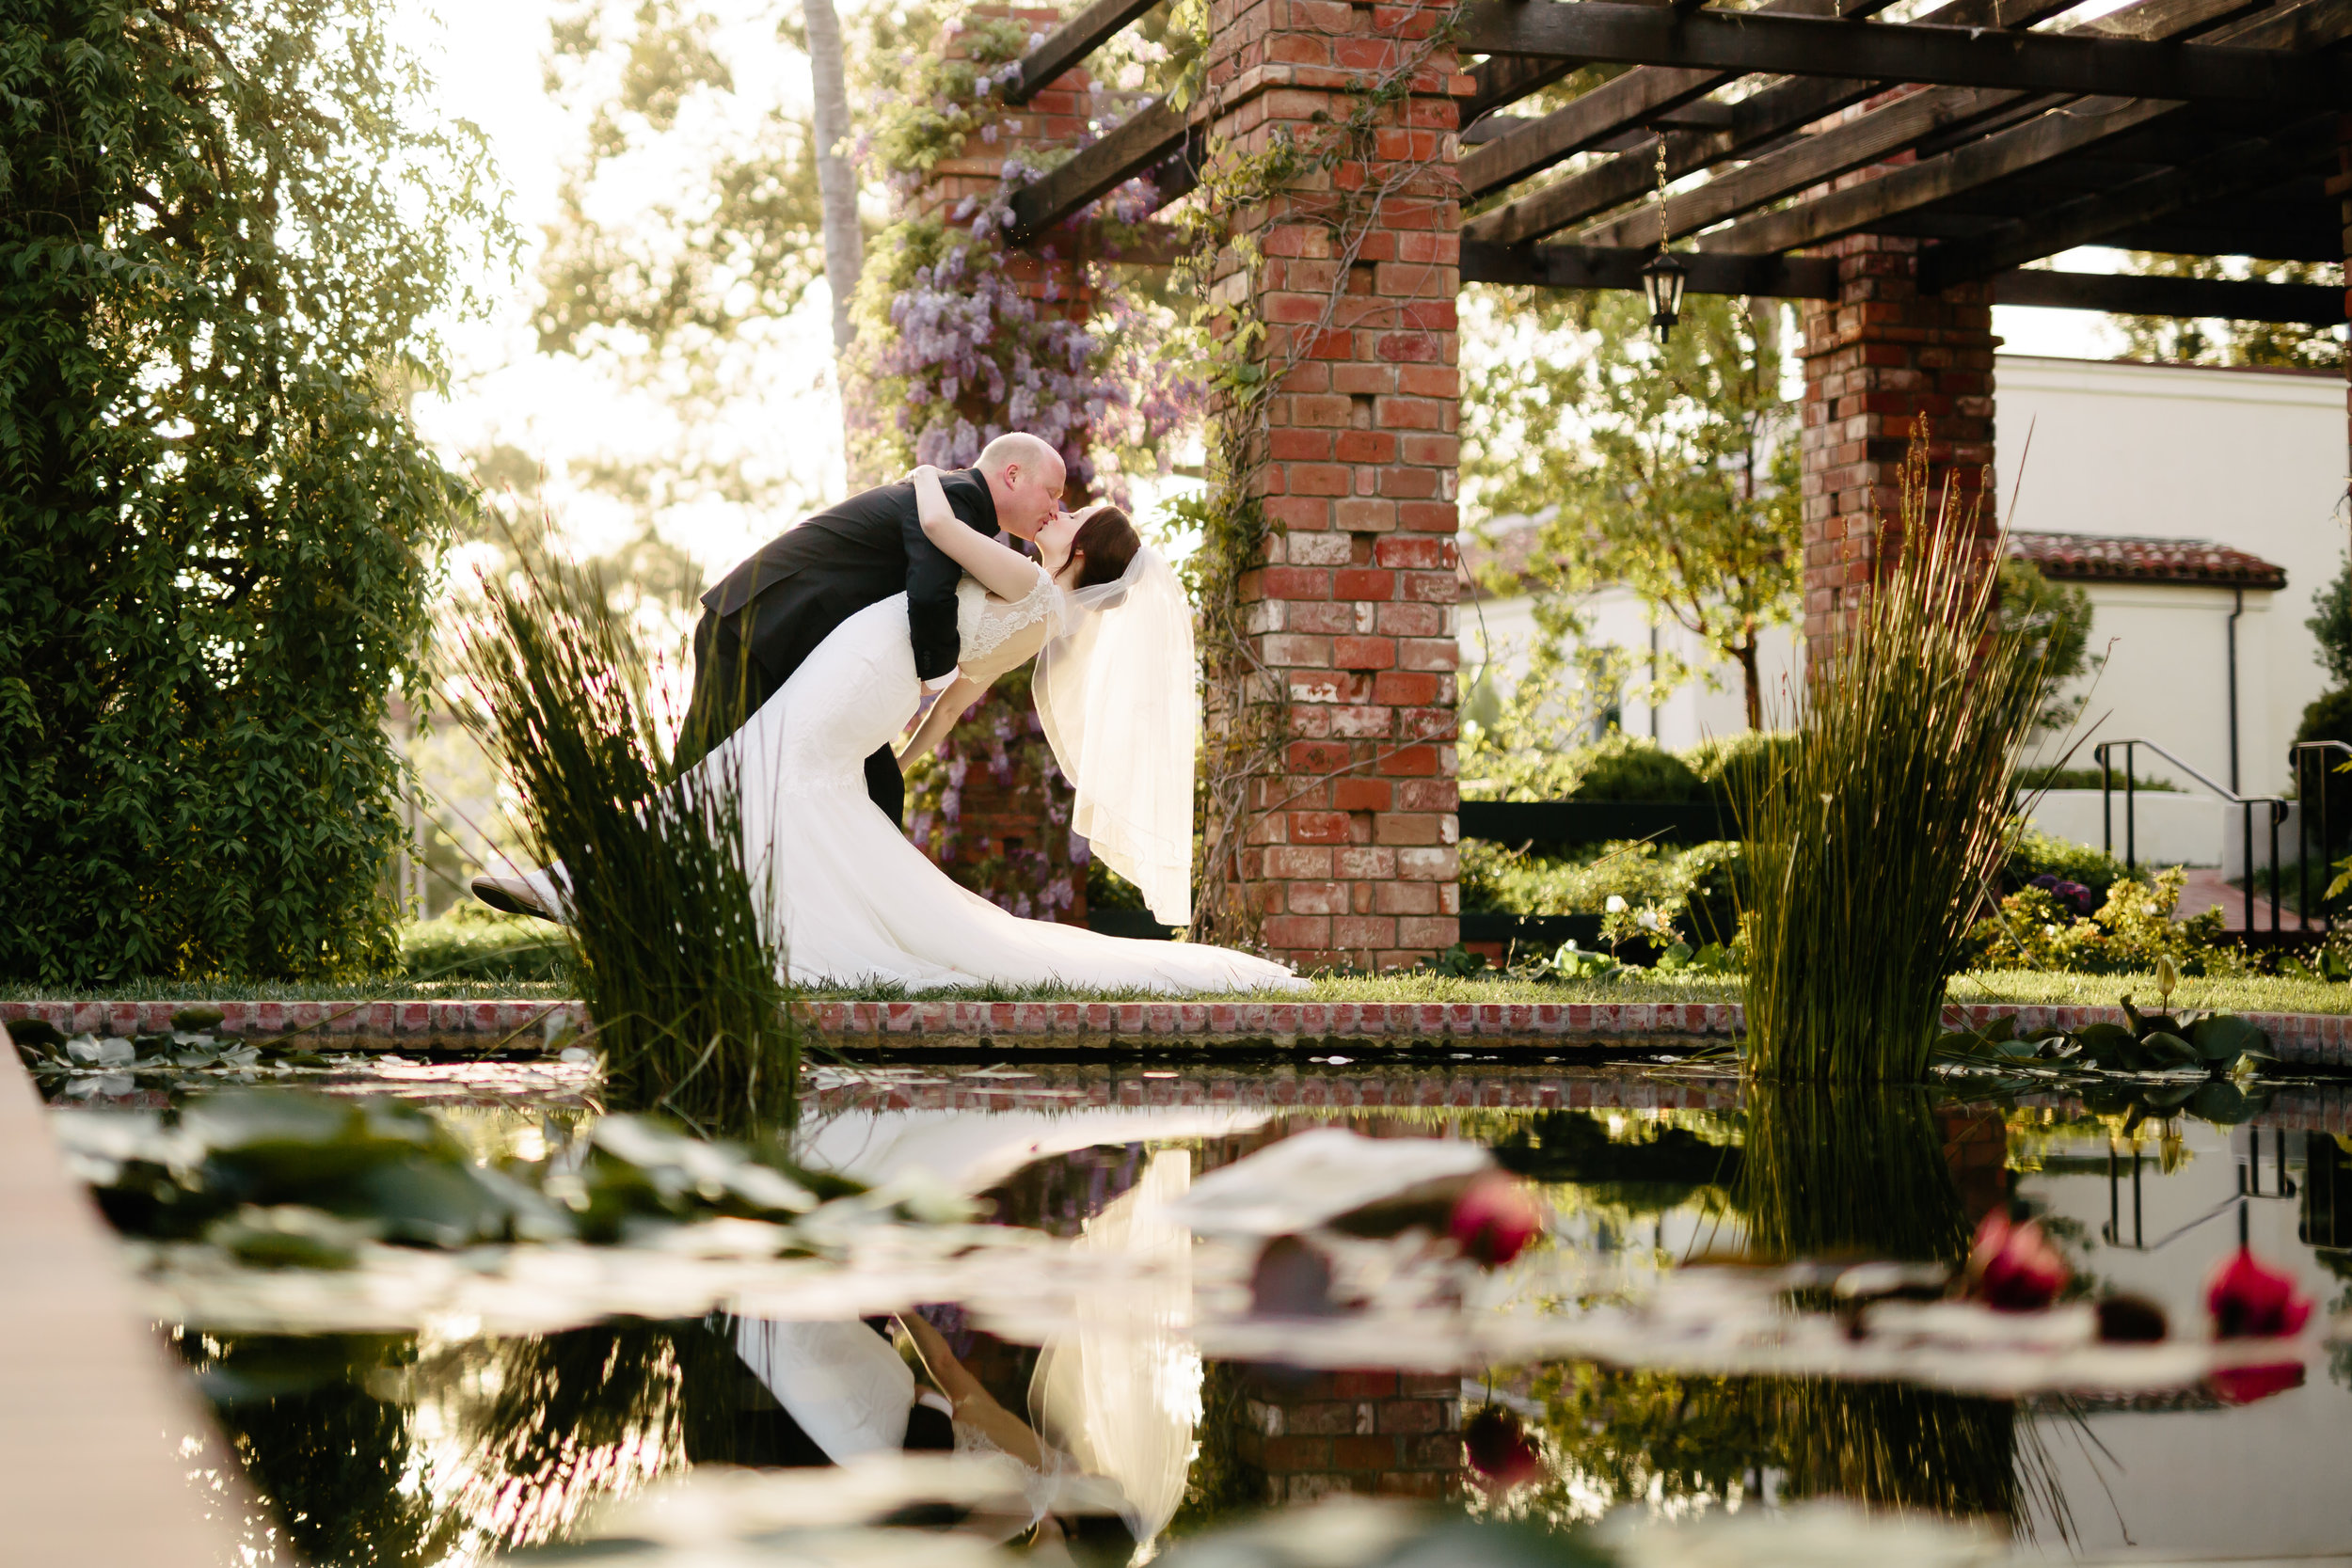 santa-barbara-elopement-wedding-planner-coordinator-day-of-el-encanto-belmond-resort-elope-lily-pond-black-tie-riviera (11).jpg